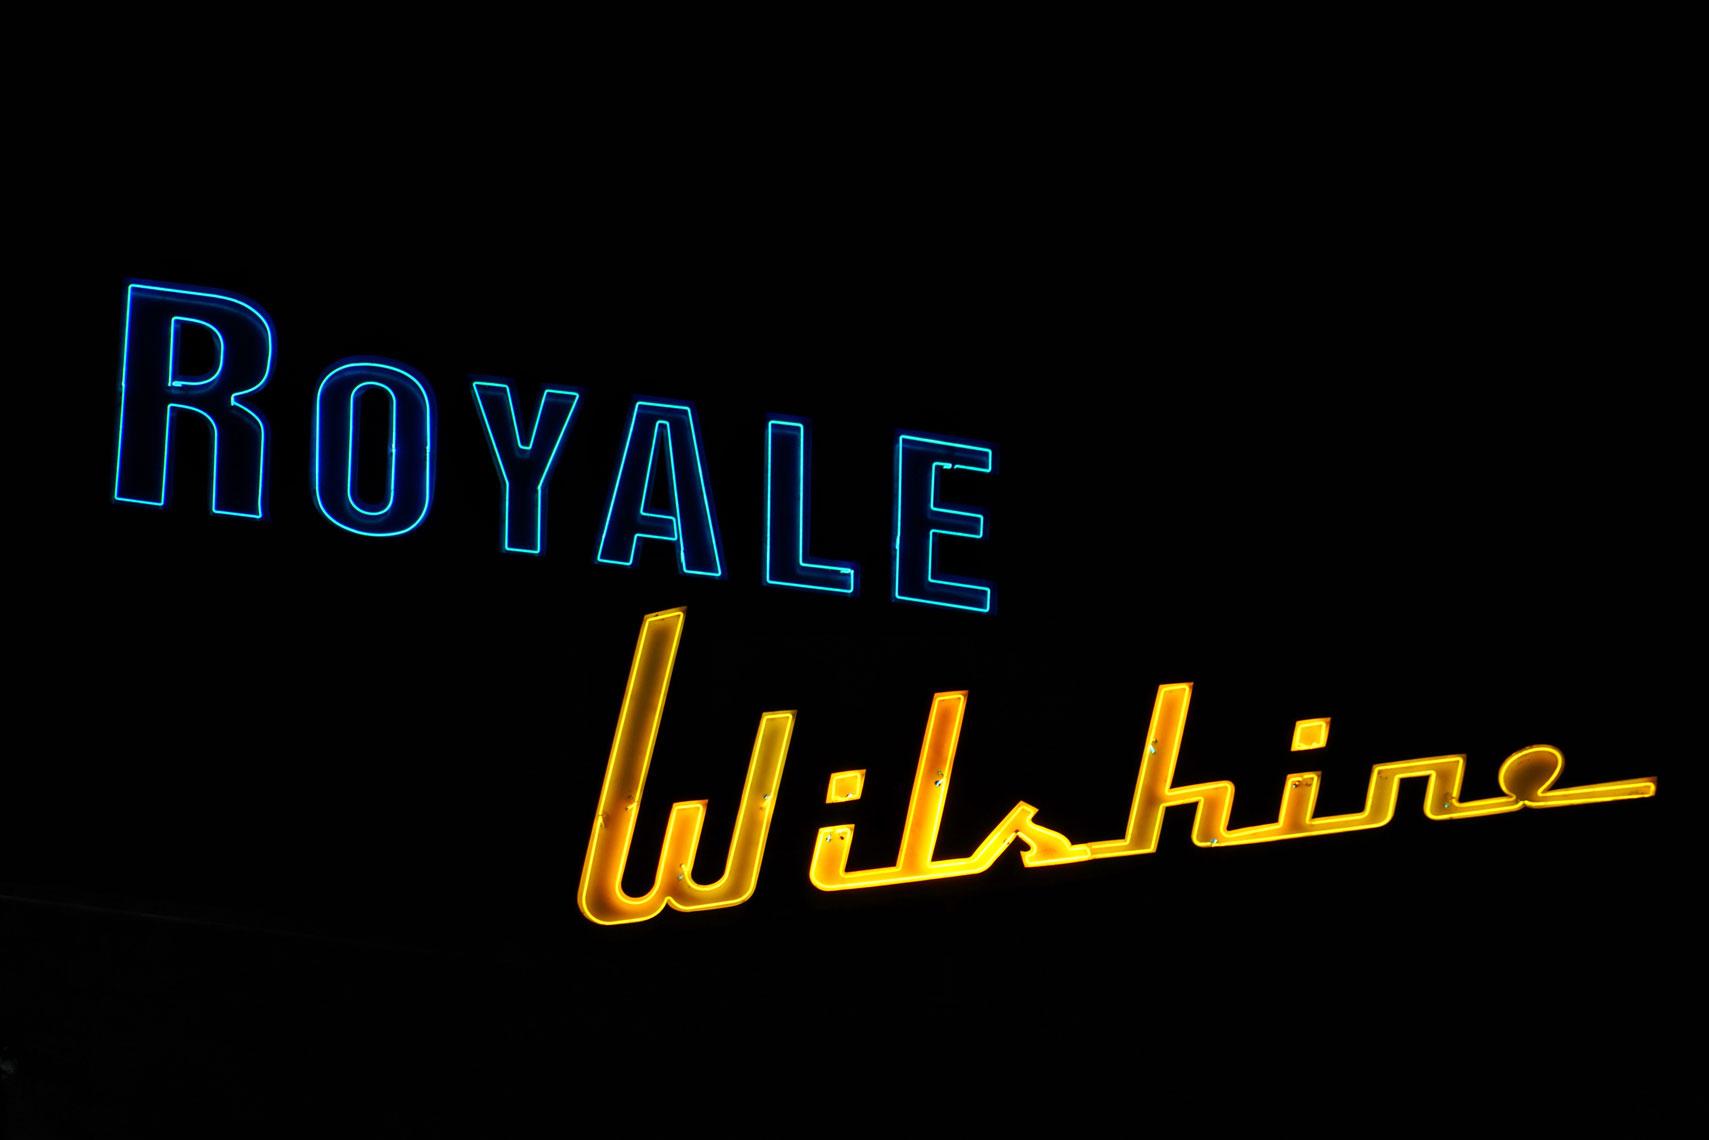 neon-royale-wilshire.jpg